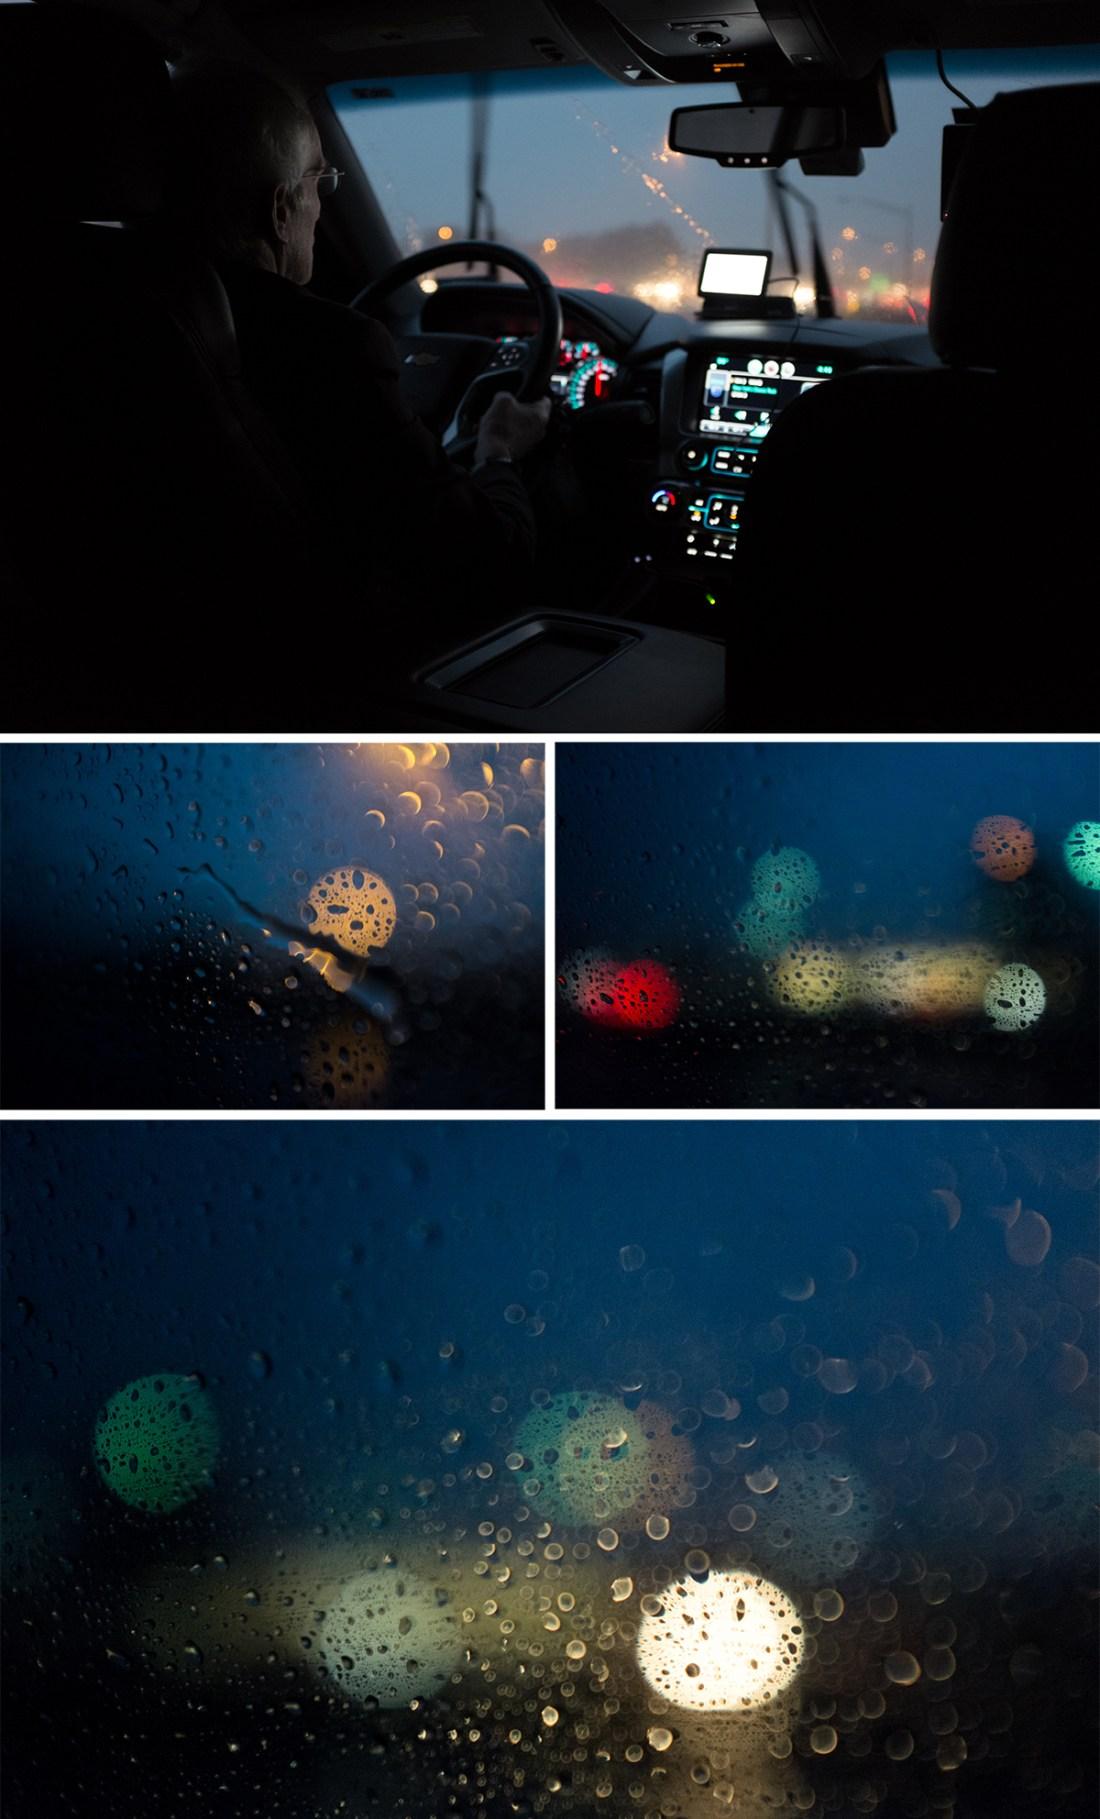 rainy-drive-to-airport